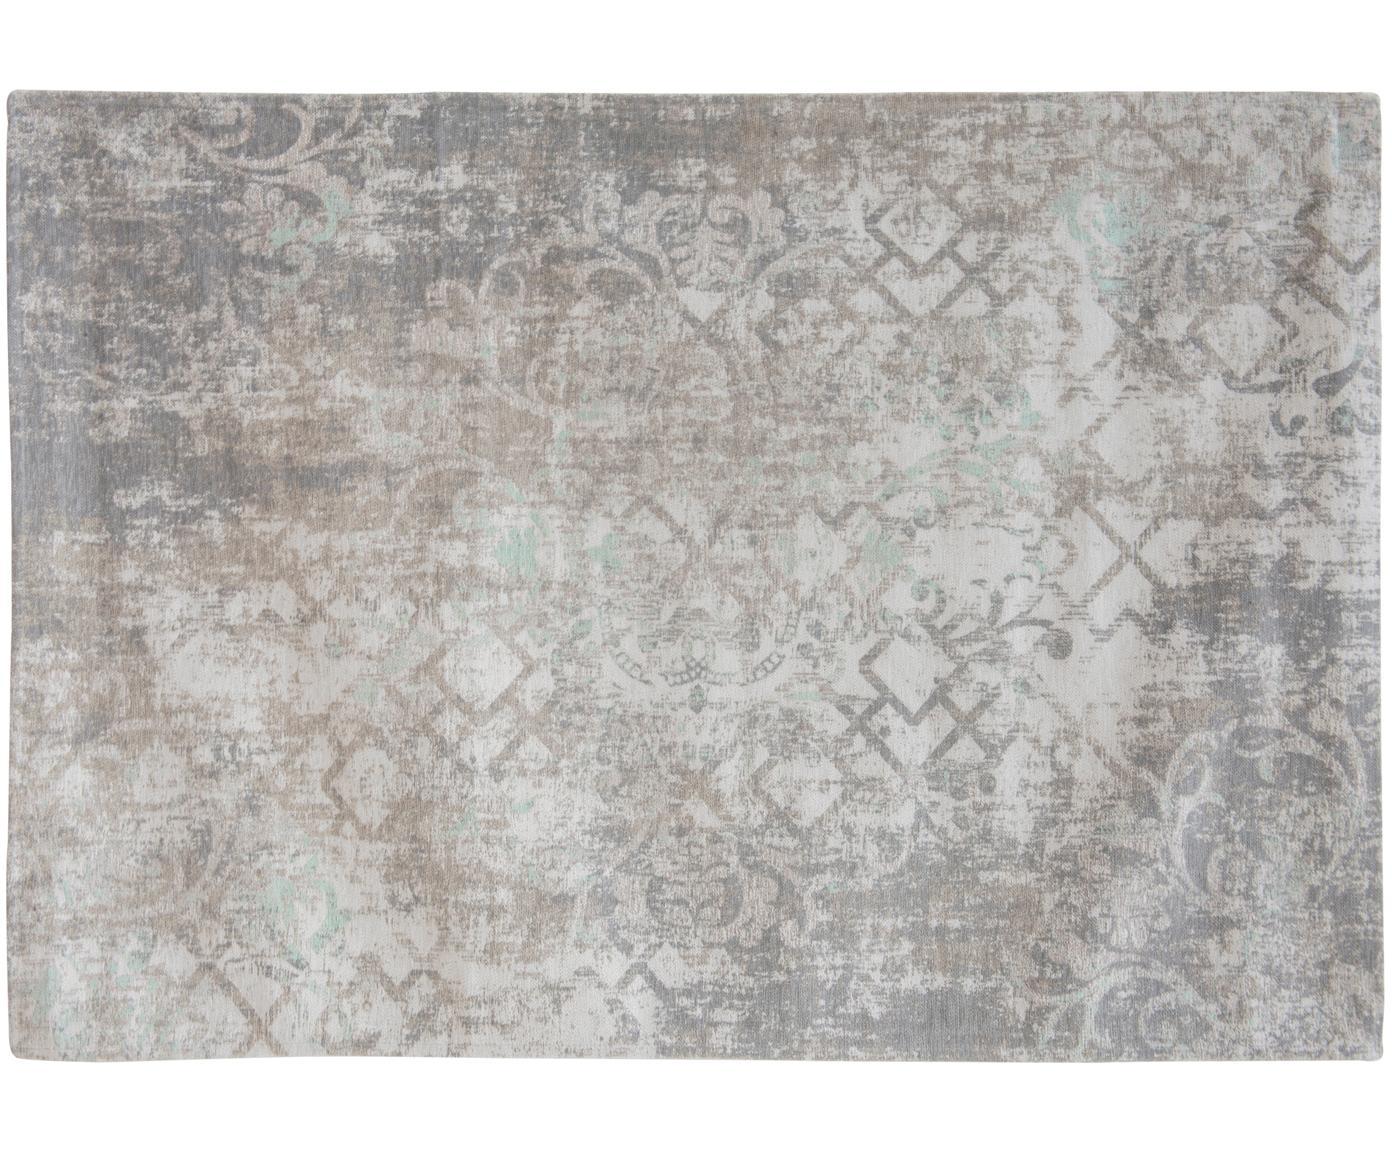 Alfombra de chenilla Babylon, estilo vintage, Parte superior: chenilla (algodón), Reverso: tejido de chenilla, recub, Gris, beige, An 140 x L 200 cm (Tamaño S)